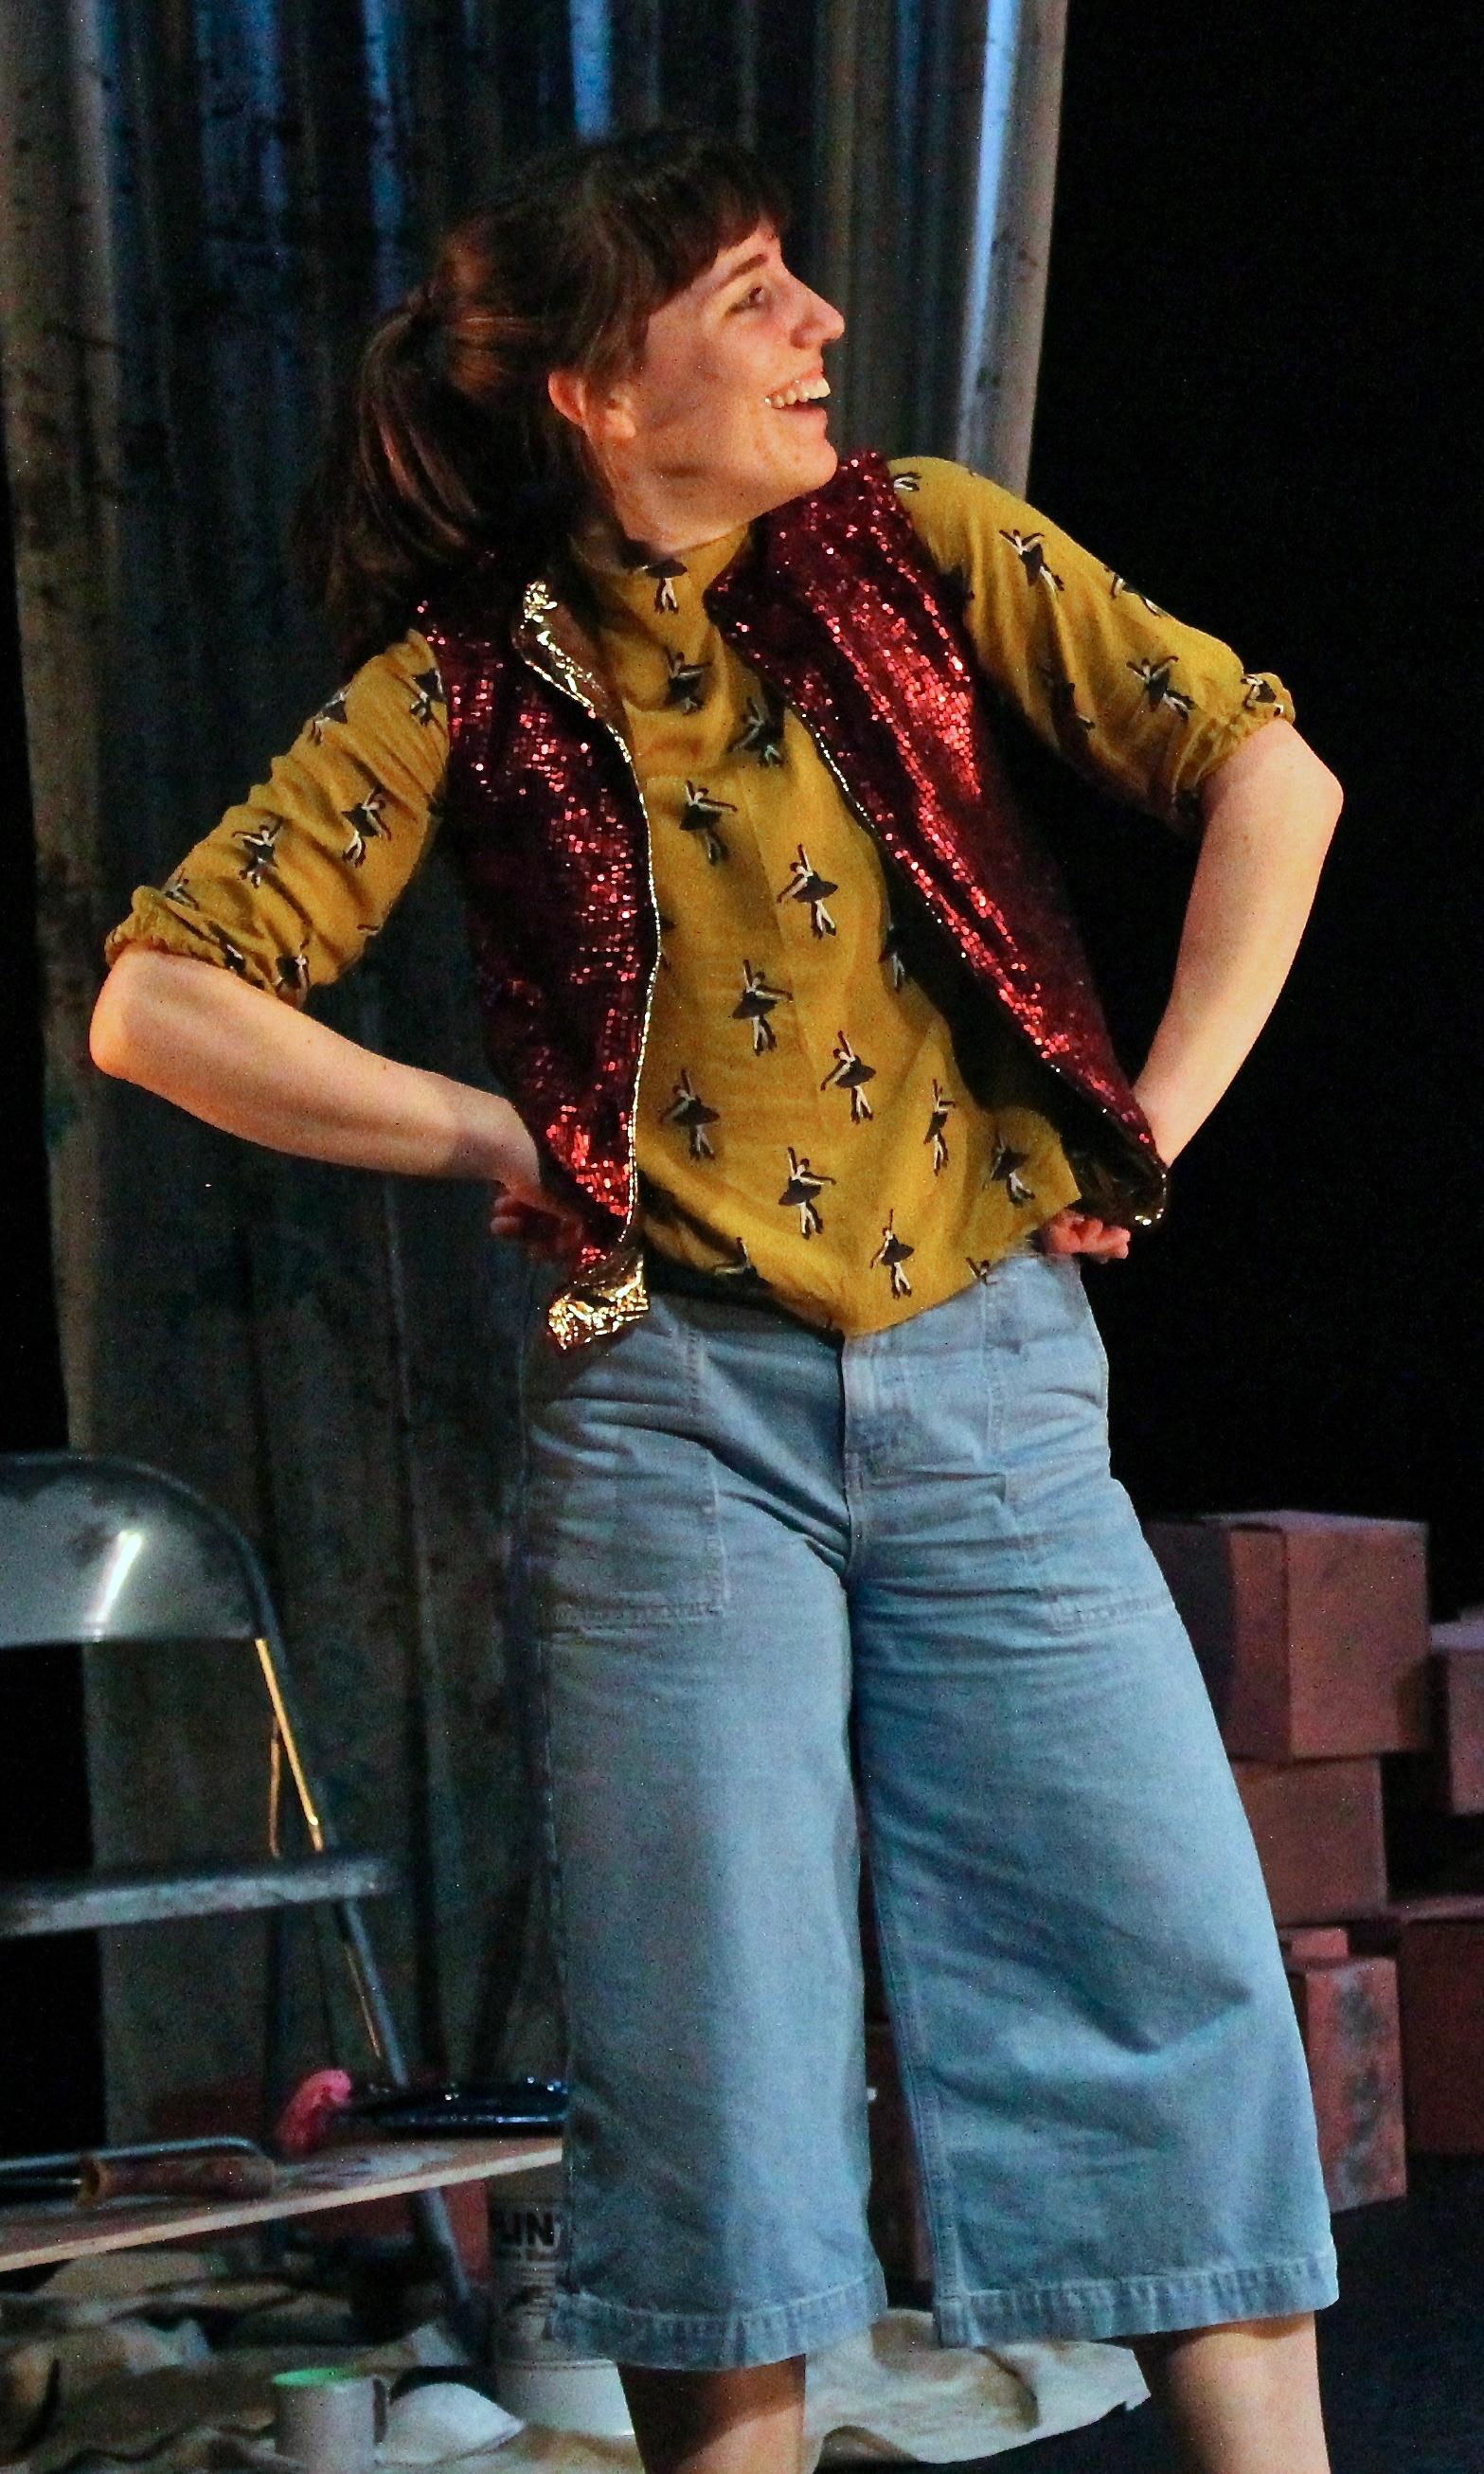 Claire Lambert in Night at the Theatre (Image: Rhiannon Williams)